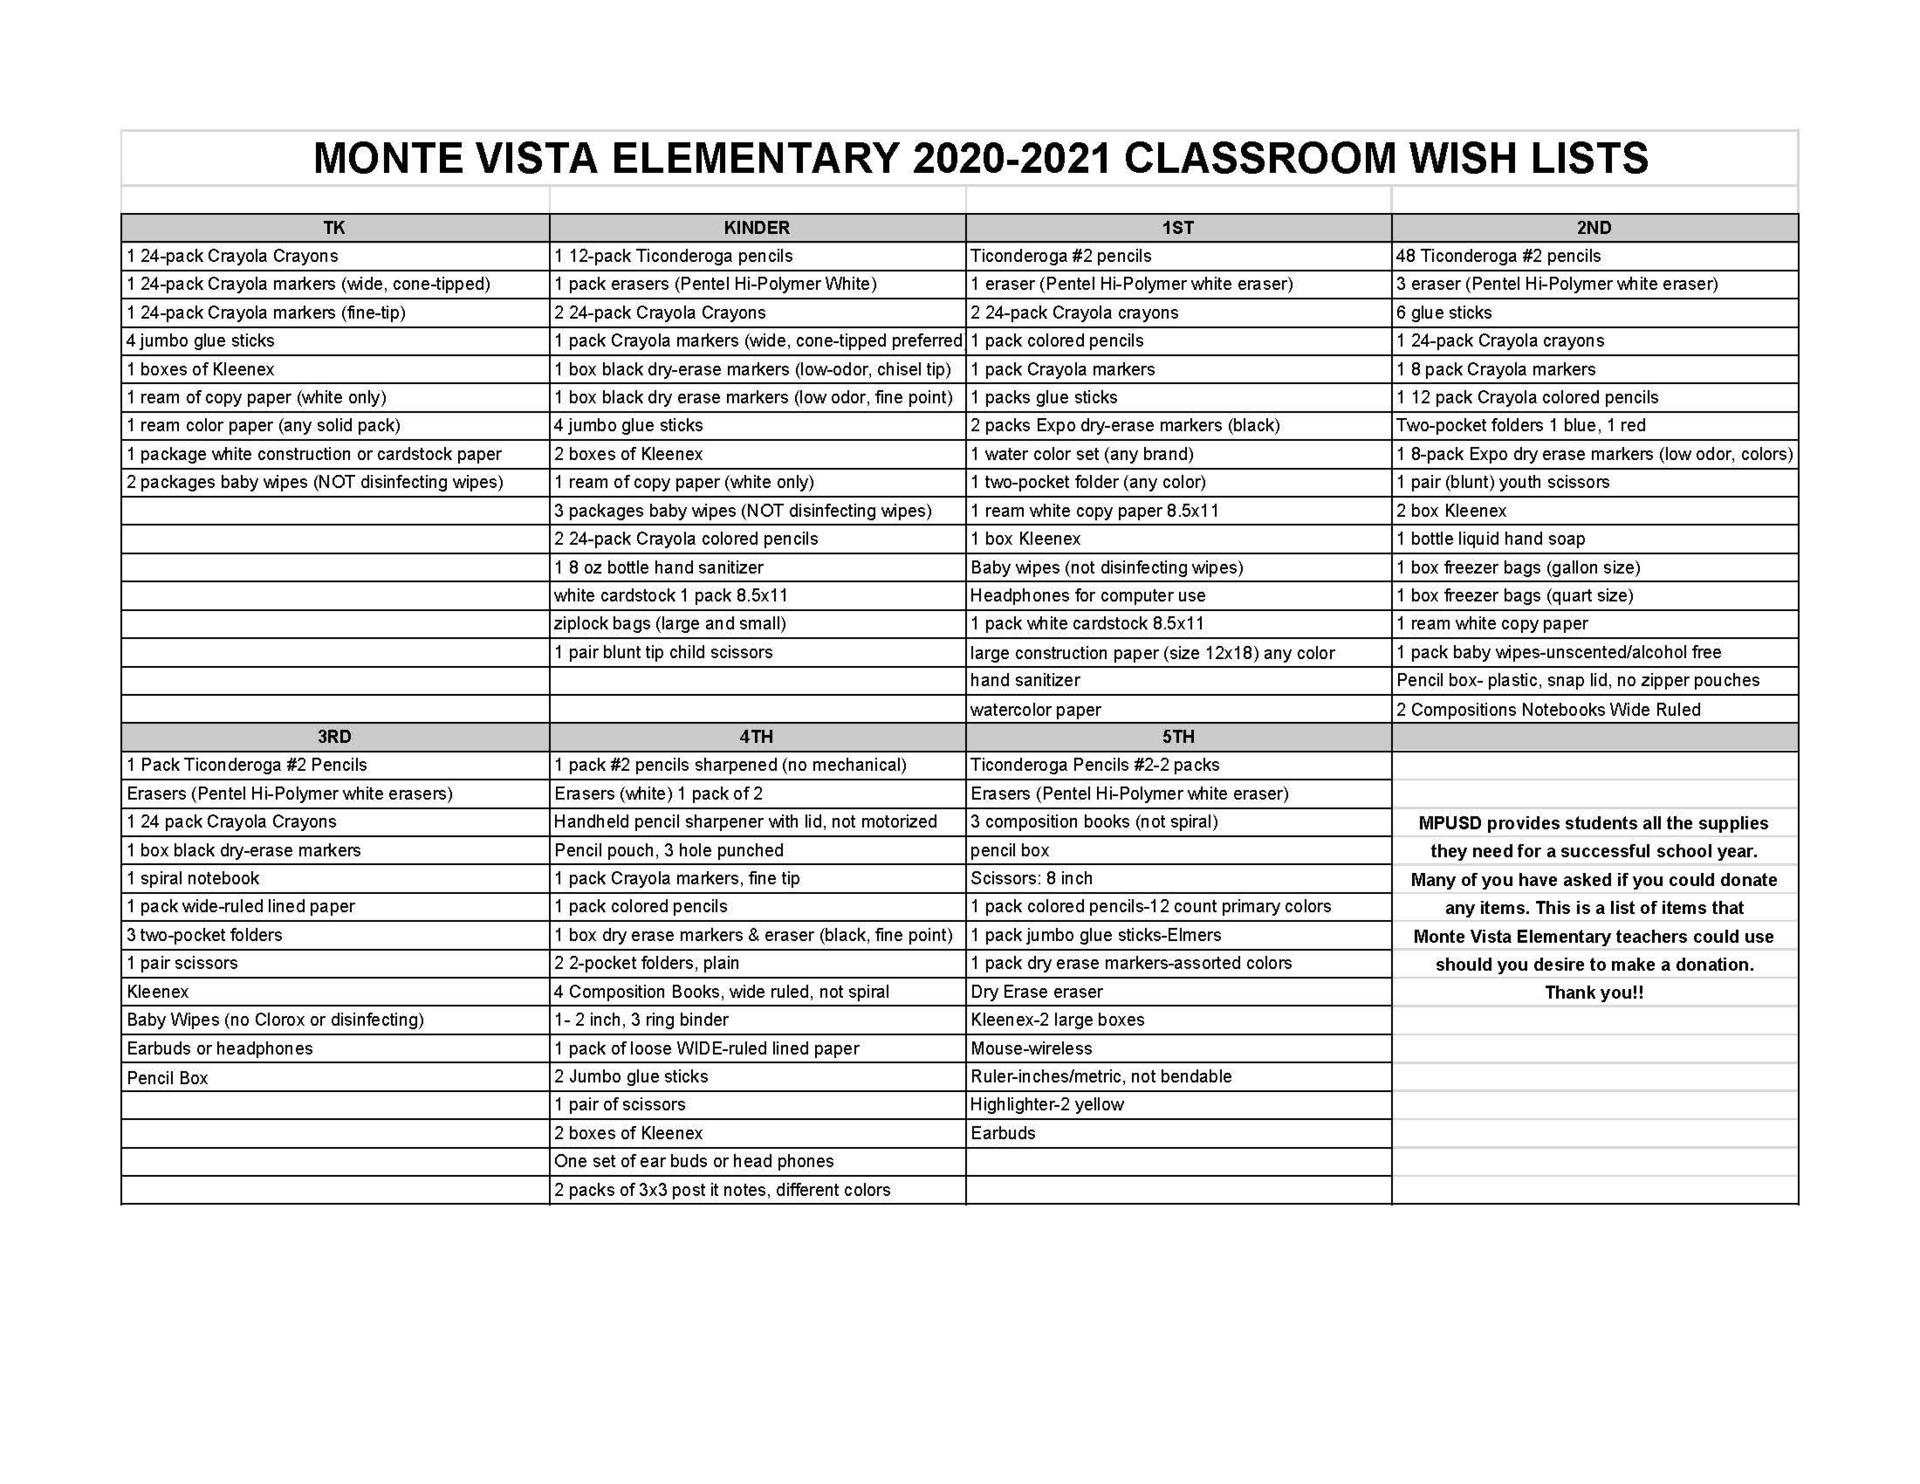 2020-2021 Classroom Wish List